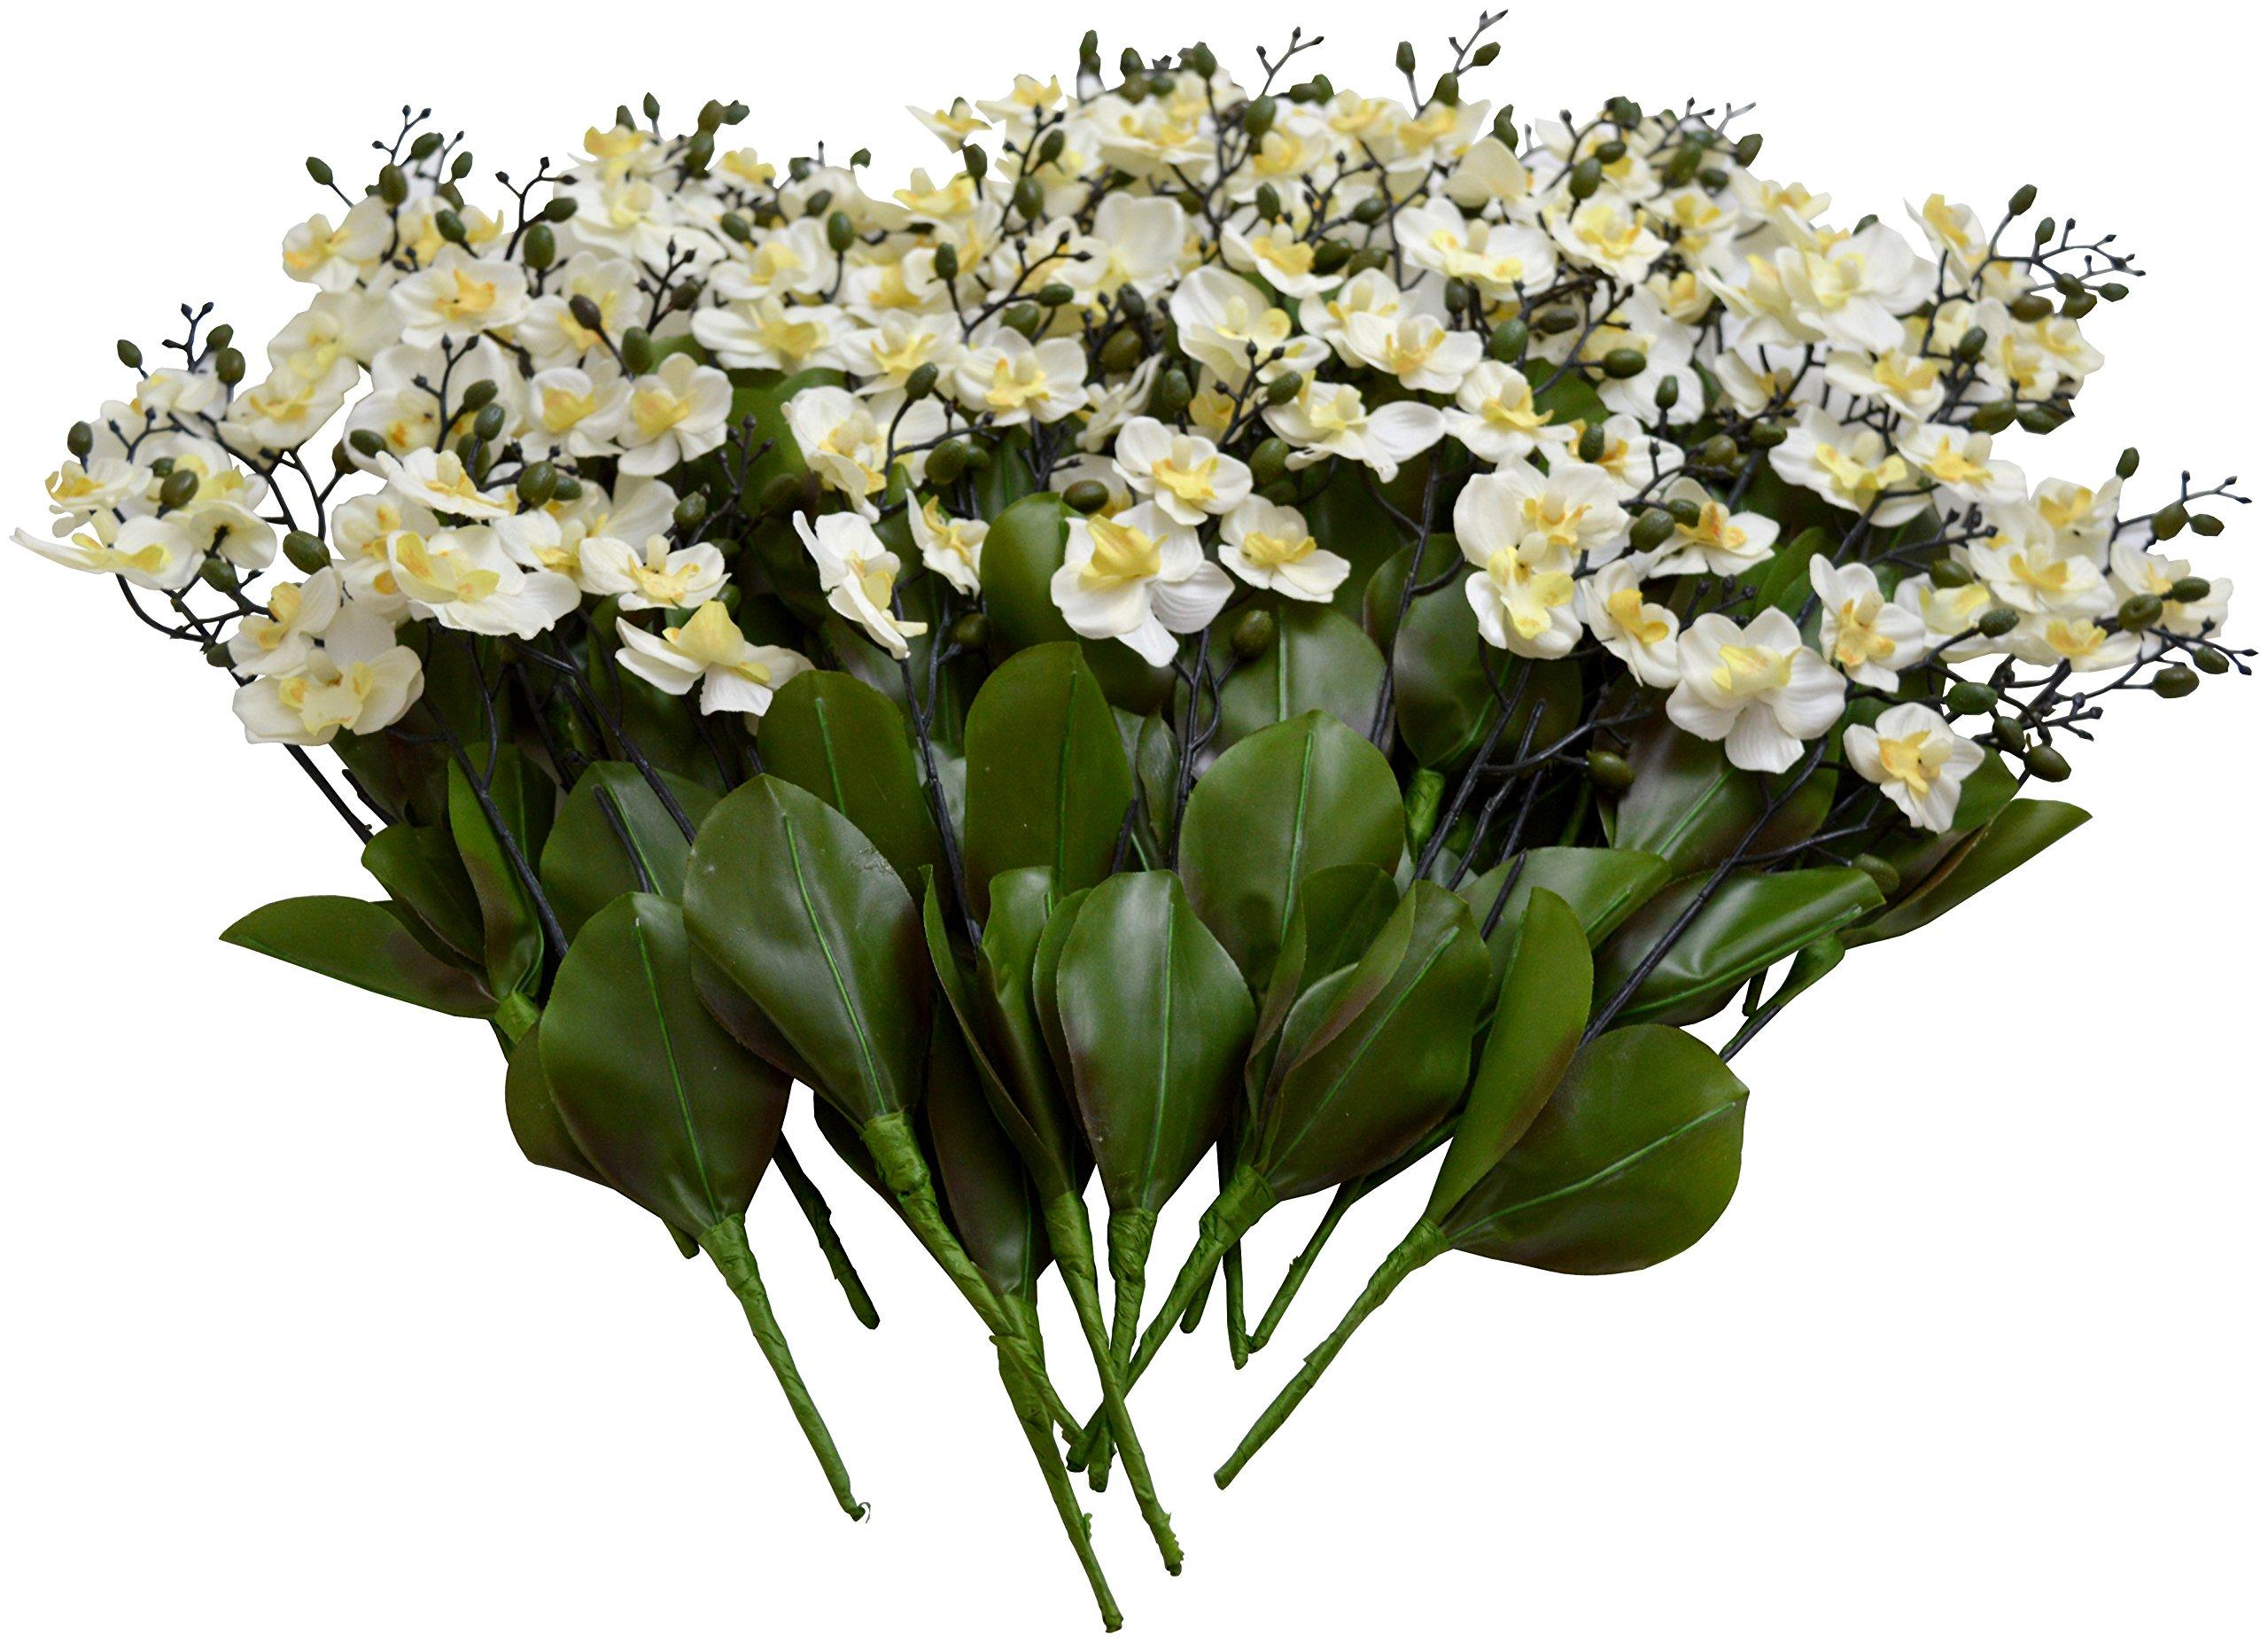 silk flower arrangements sia home fashions 12-pack décor permanent botanicals 11-inch orchid spray, mini, white